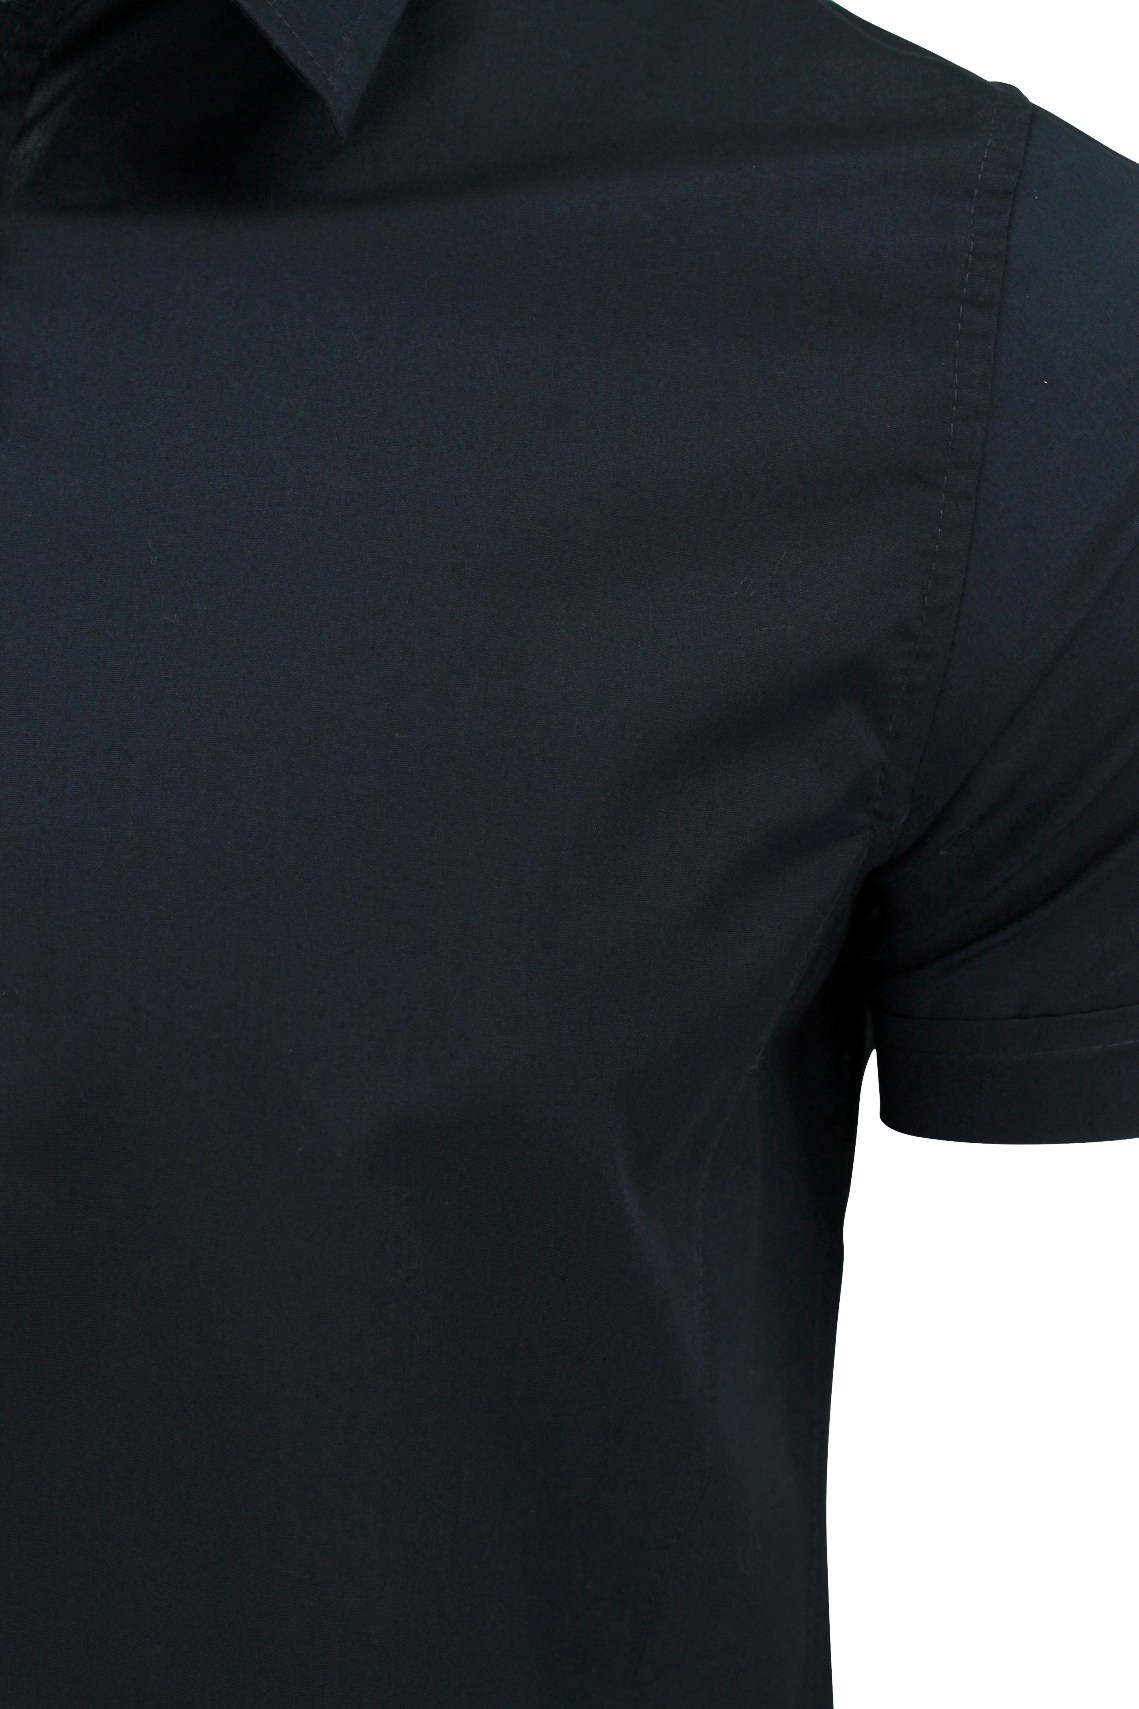 Brave-Soul-Mens-Plain-Shirt-Short-Sleeved-Slim-Fit thumbnail 19